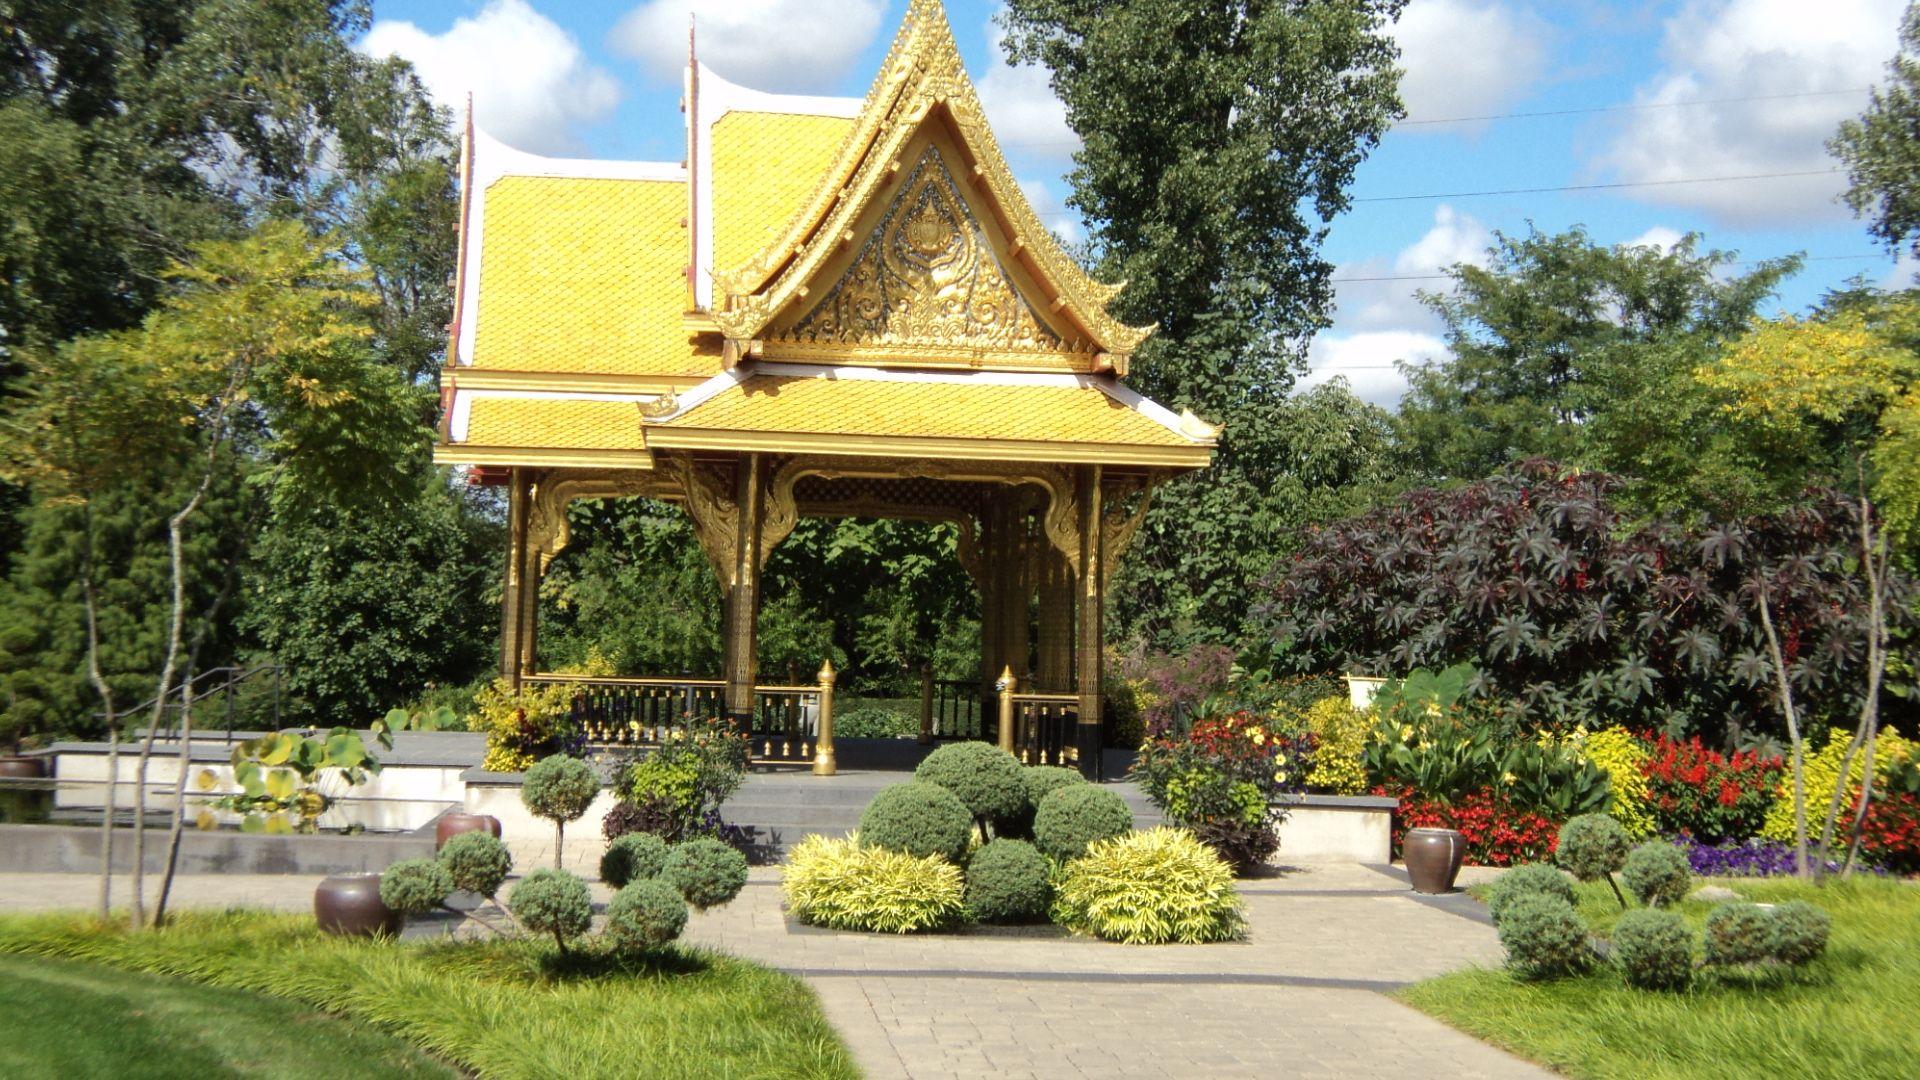 olbrich botanical gardens madison wi favorite places spaces pi